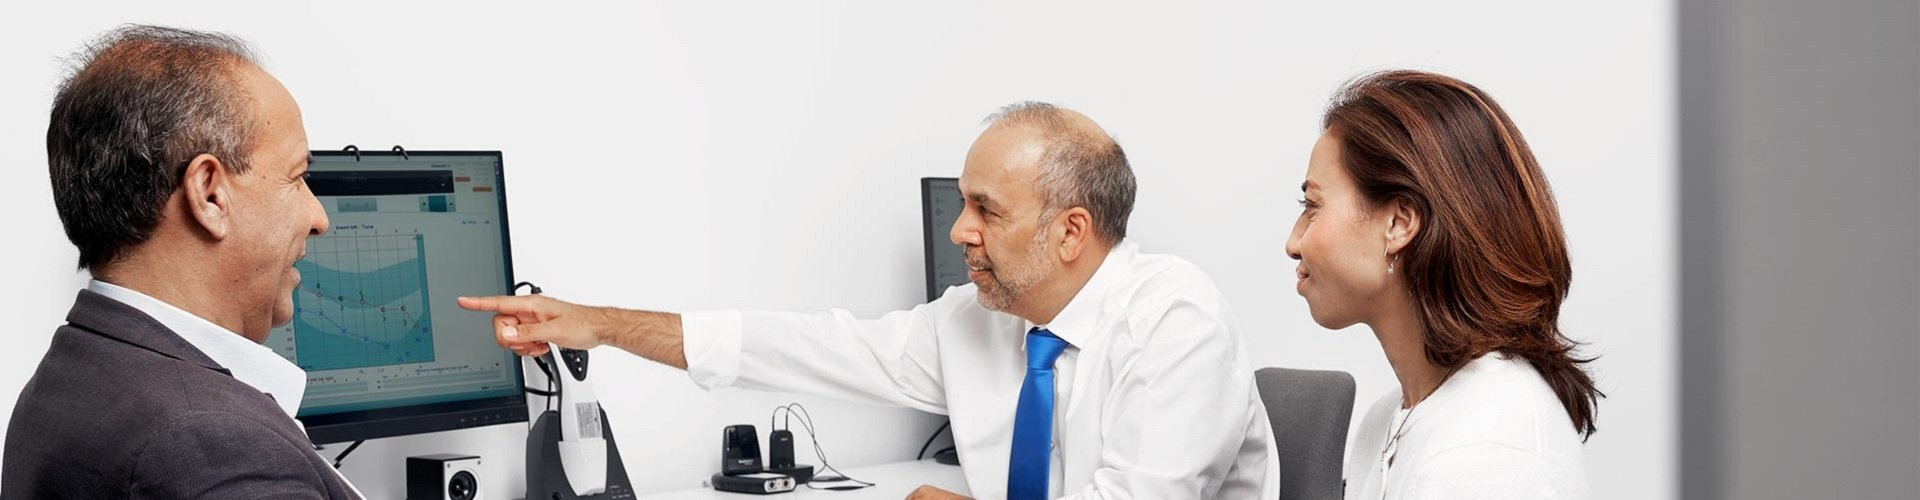 audiogramme-resultat-test-auditif